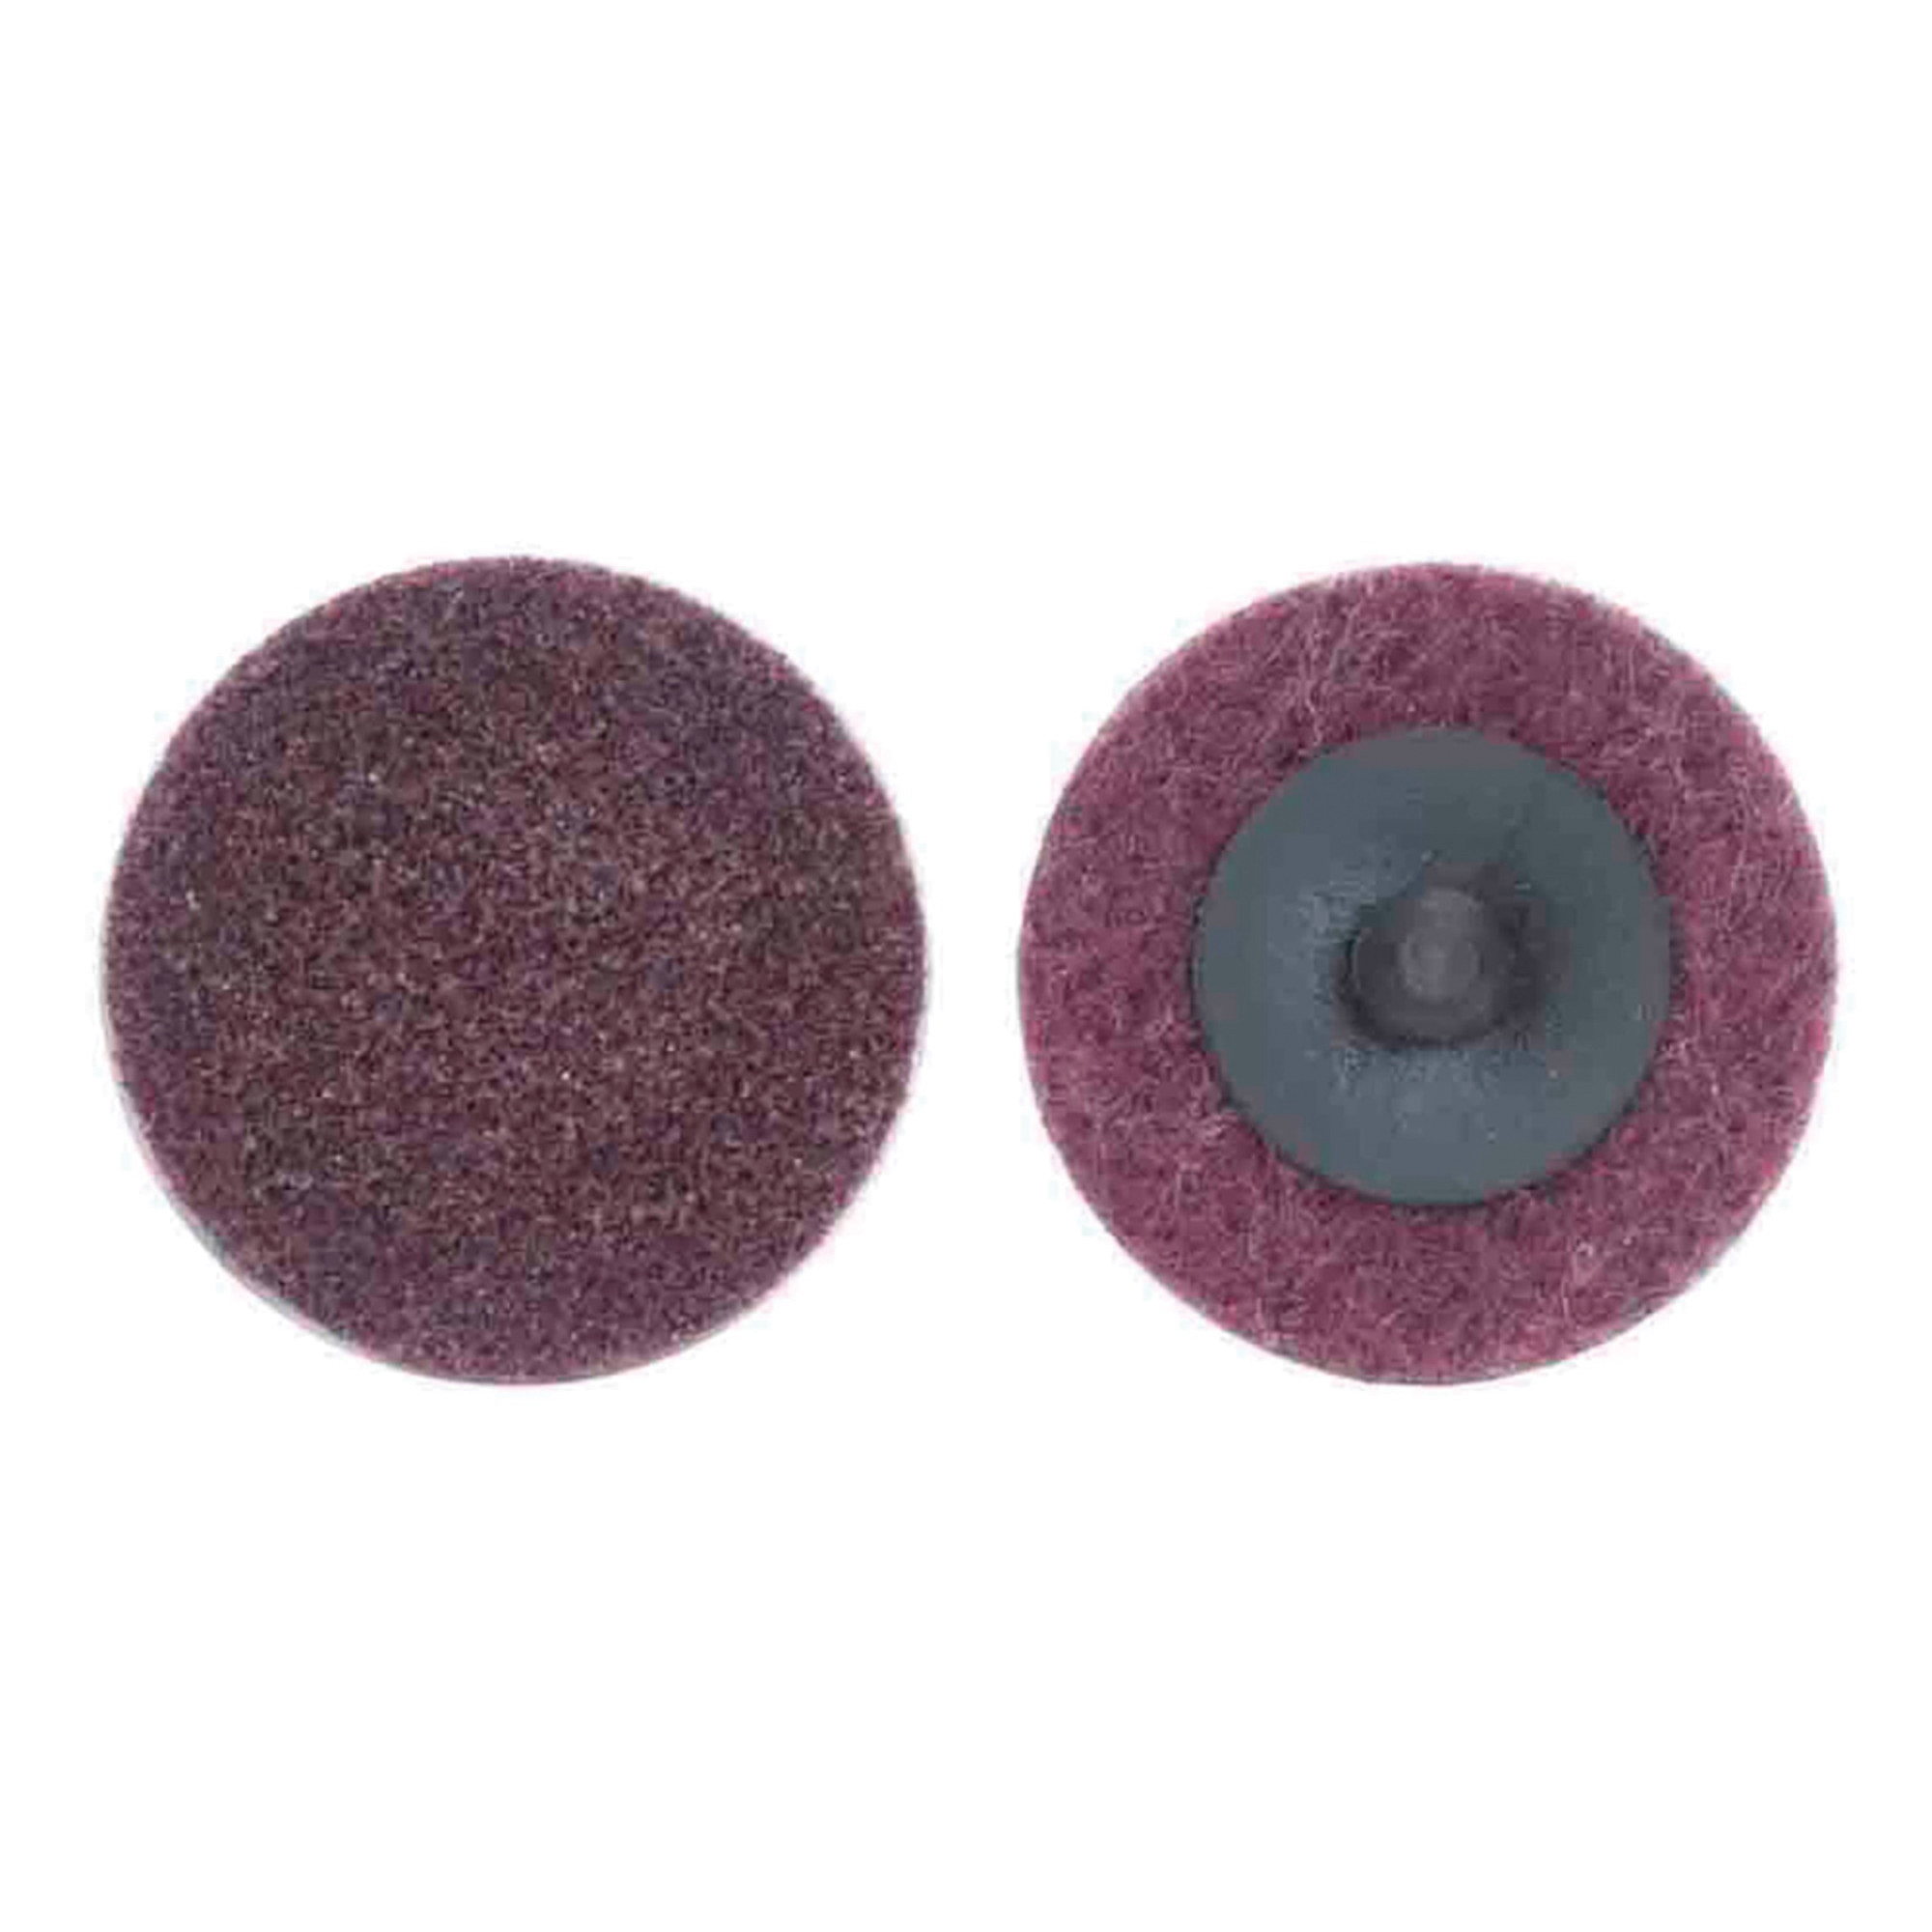 Merit® 08834166290 Non-Woven Abrasive Quick-Change Disc, 2 in Dia, 80 Grit, Medium Grade, Aluminum Oxide Abrasive, Type TR (Type III) Attachment